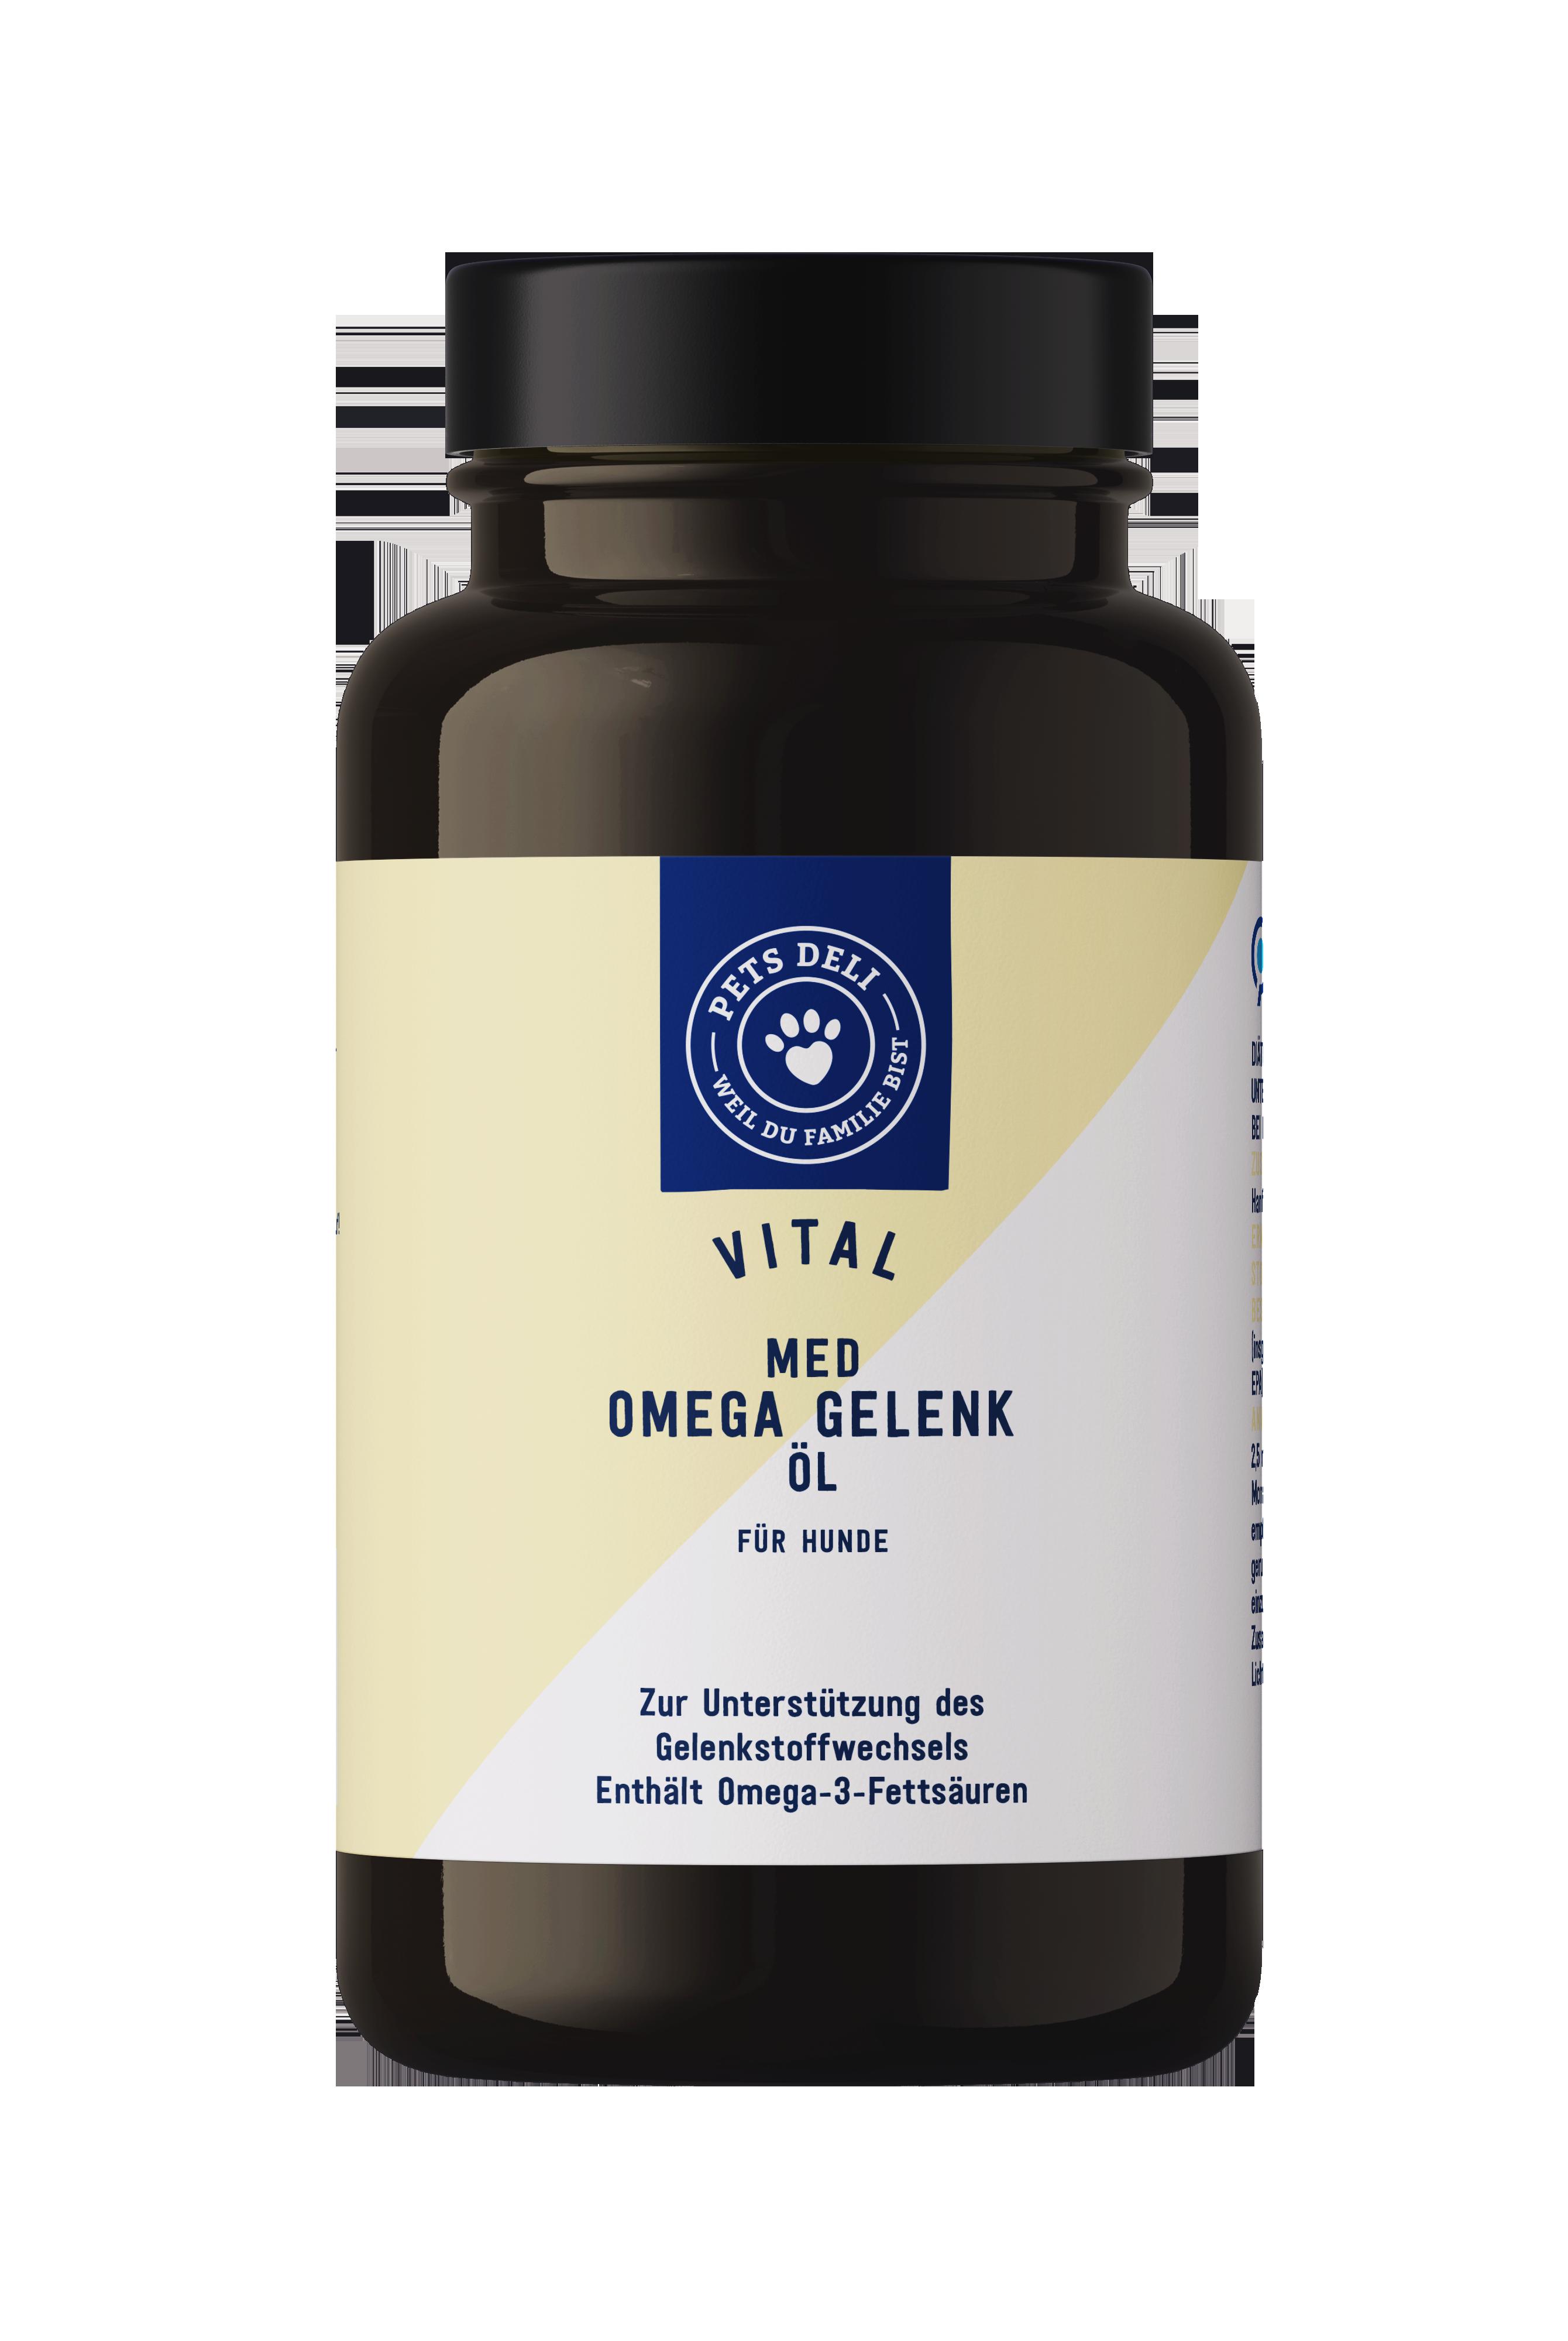 PETS DELI Omega Gelenk Öl 250ml